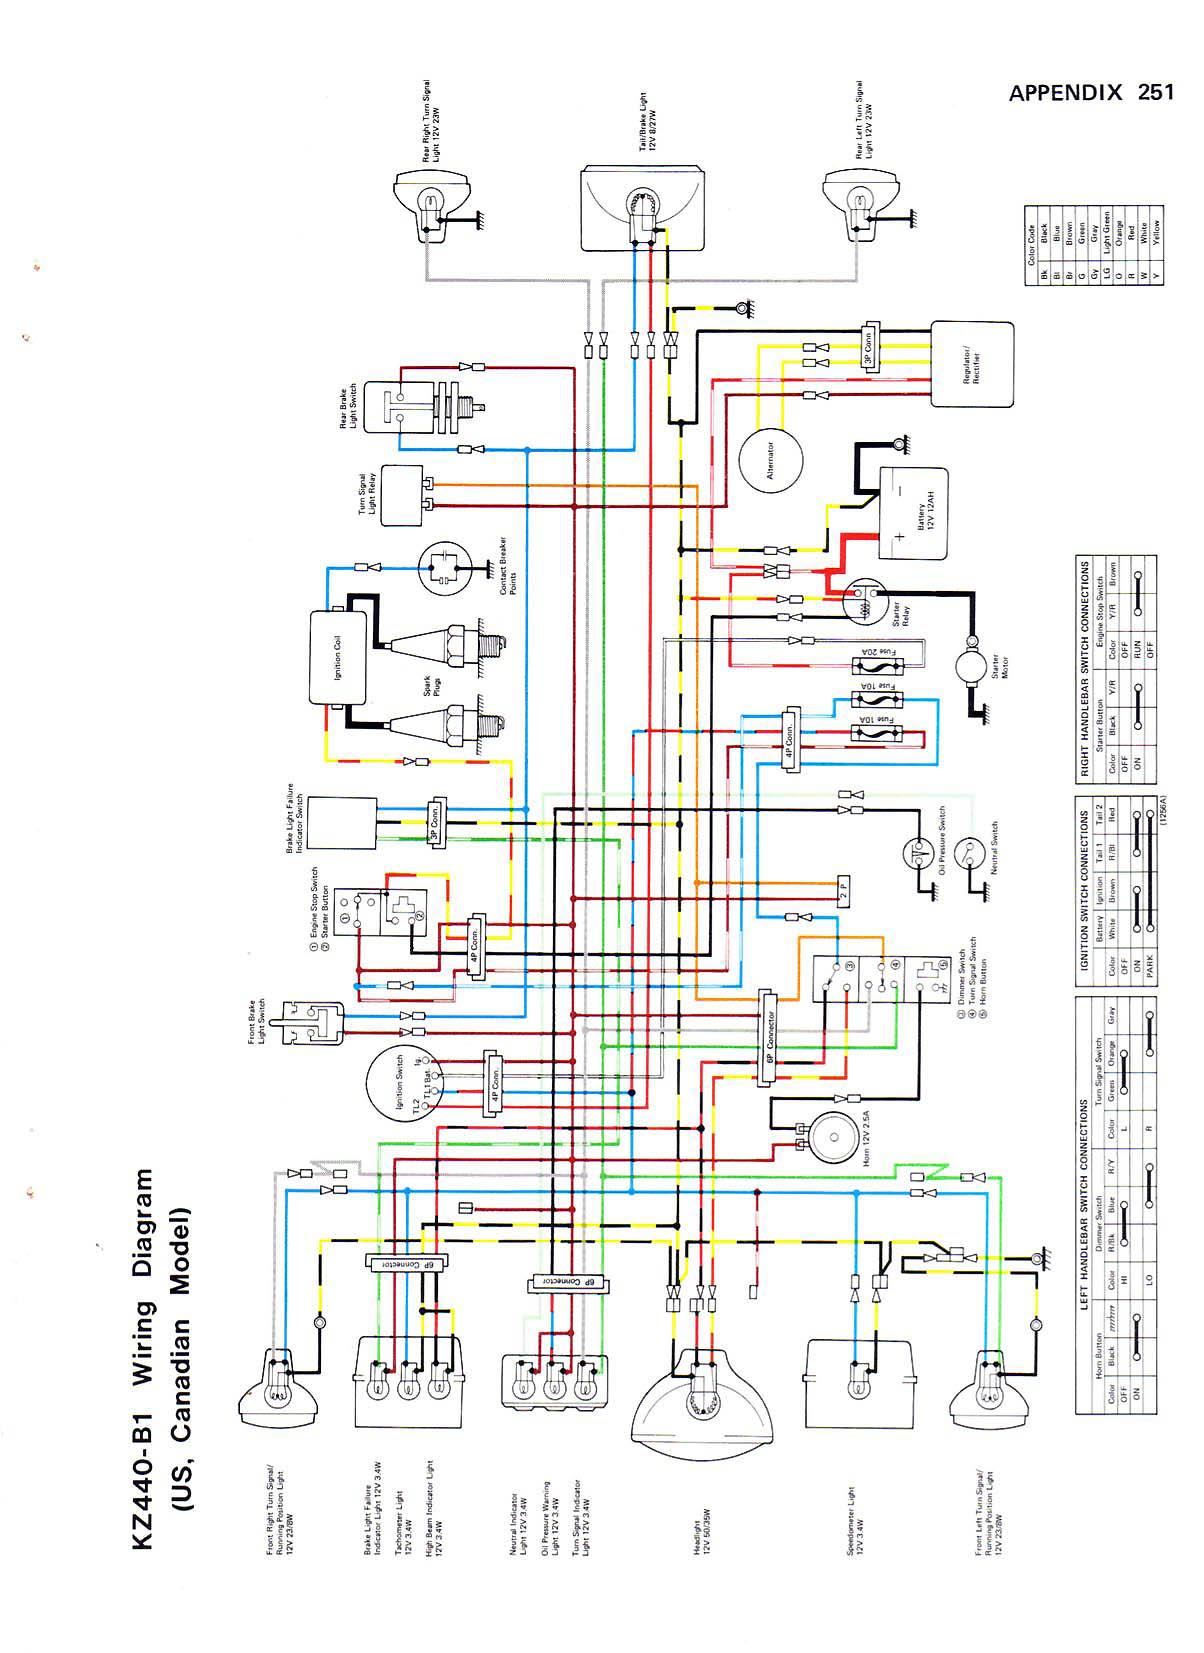 kawasaki wiring diagram hino 500 schematic kz440 all data index of diagrams simple chopper kz 440 80 a